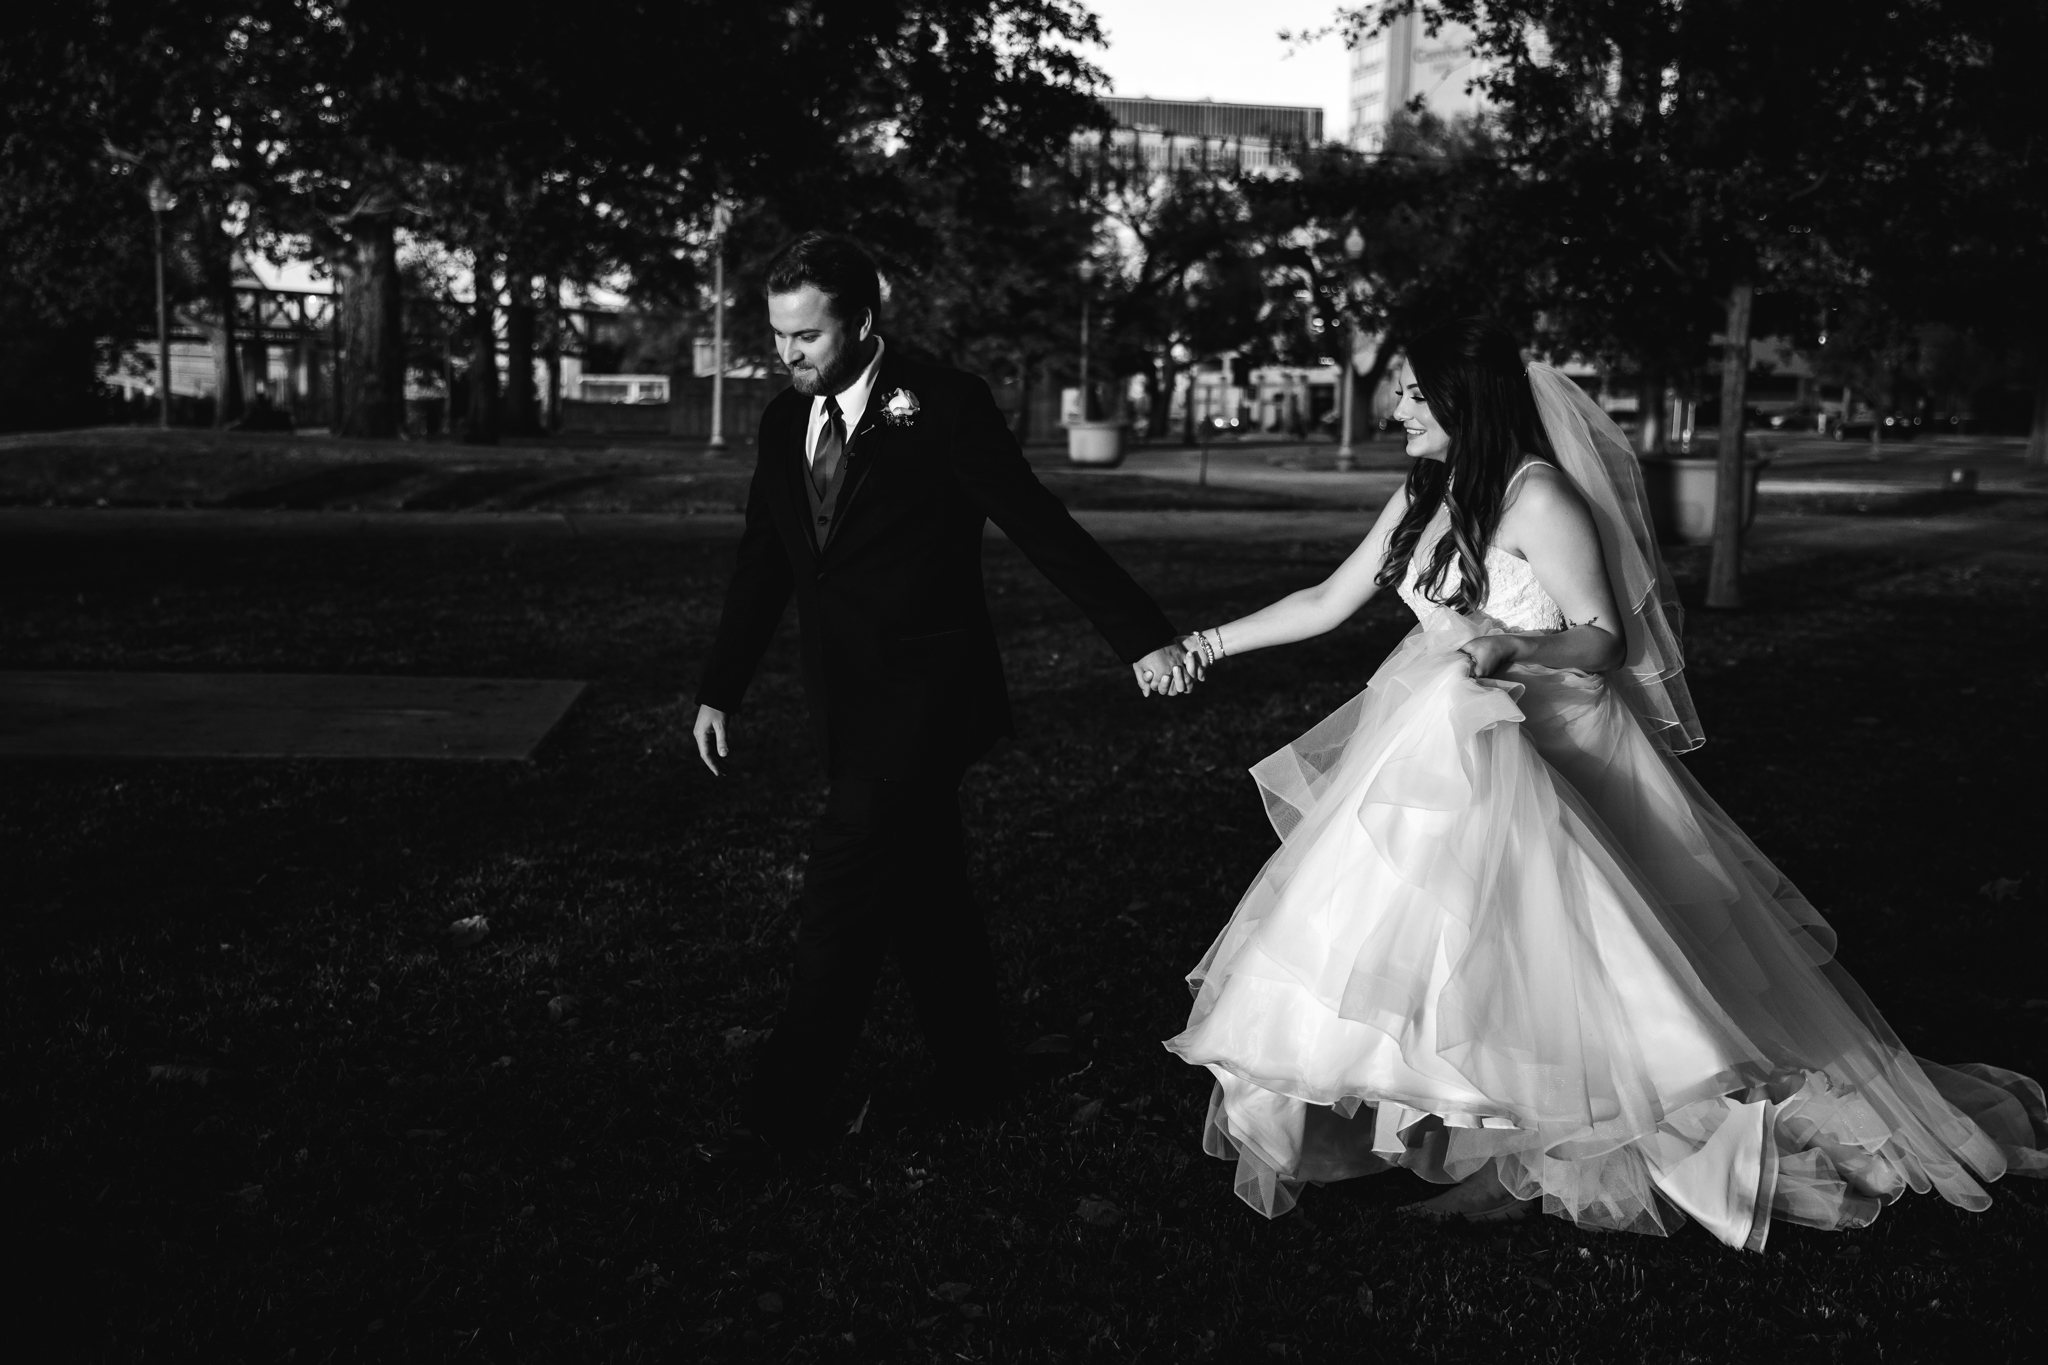 memphis-wedding-photographers-thewarmtharoundyou-ballinese-ballroom (80 of 232).jpg